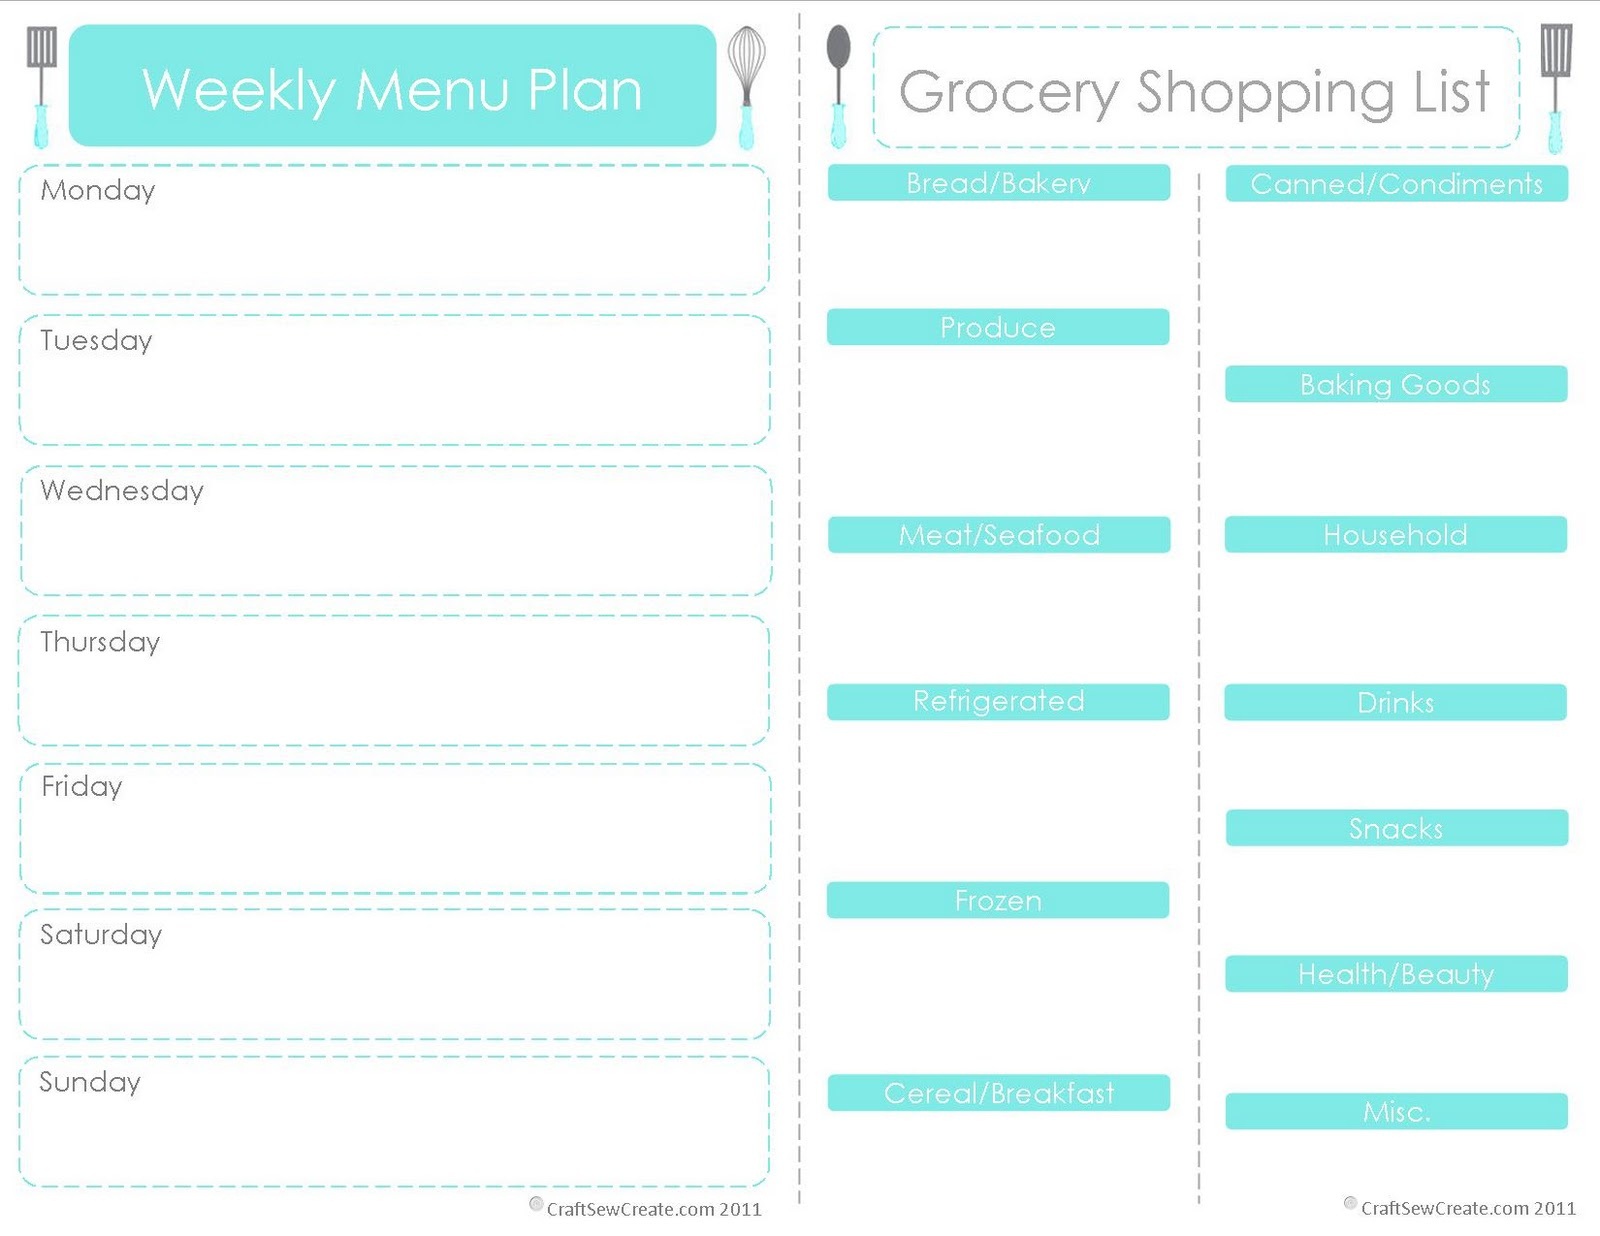 Craft Sew Create: Free Printable Menu Plan + Shopping List - Create A Menu Free Printable